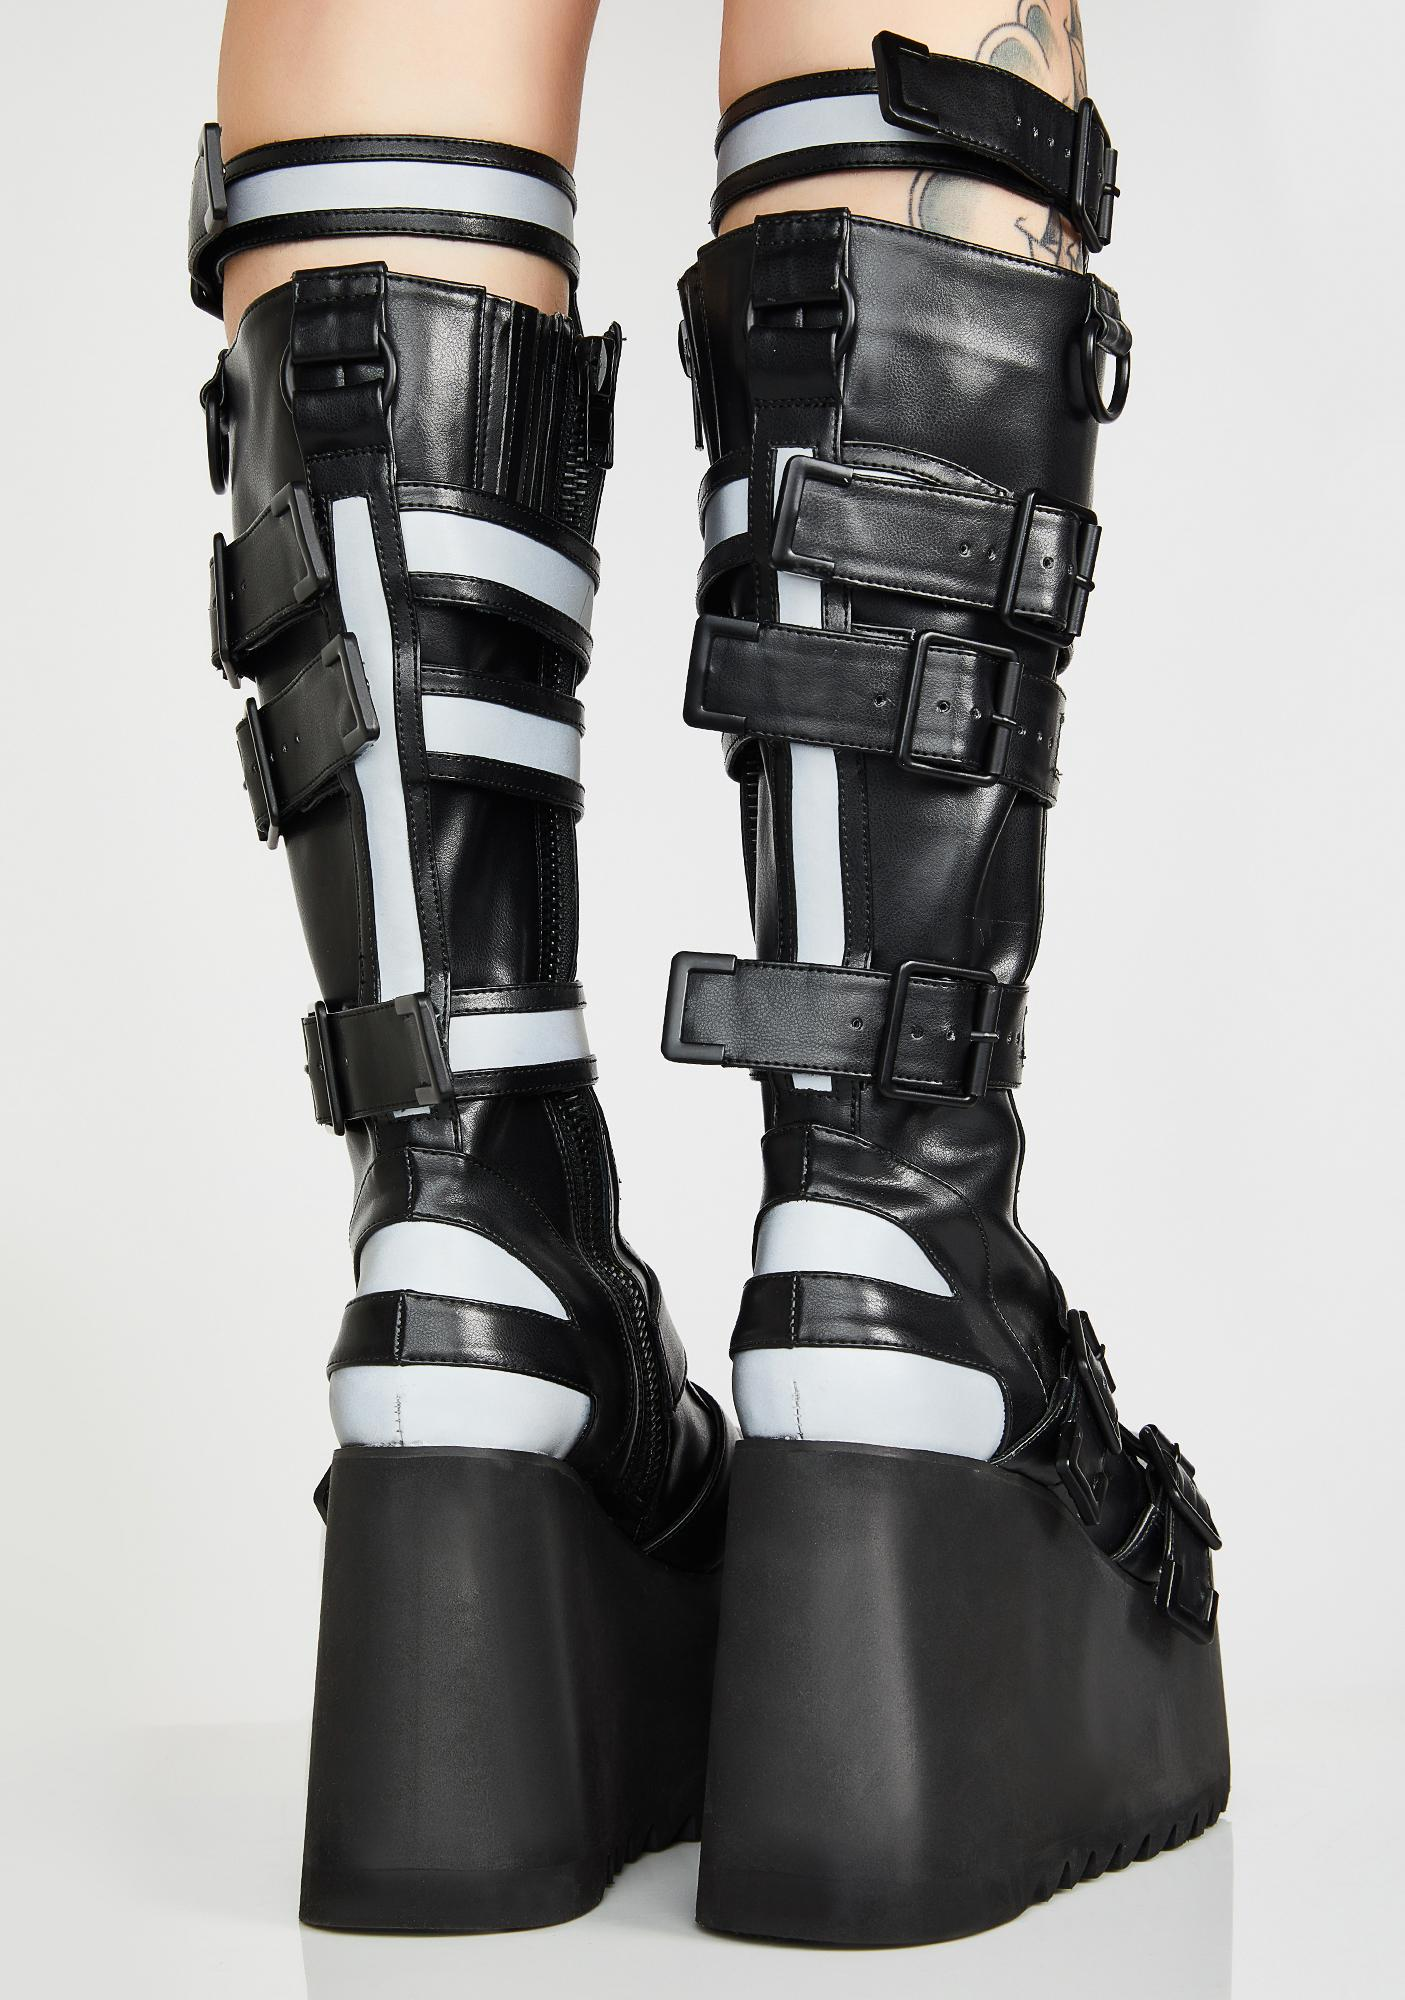 Club Exx Mindwarp Reflective Platform Boots